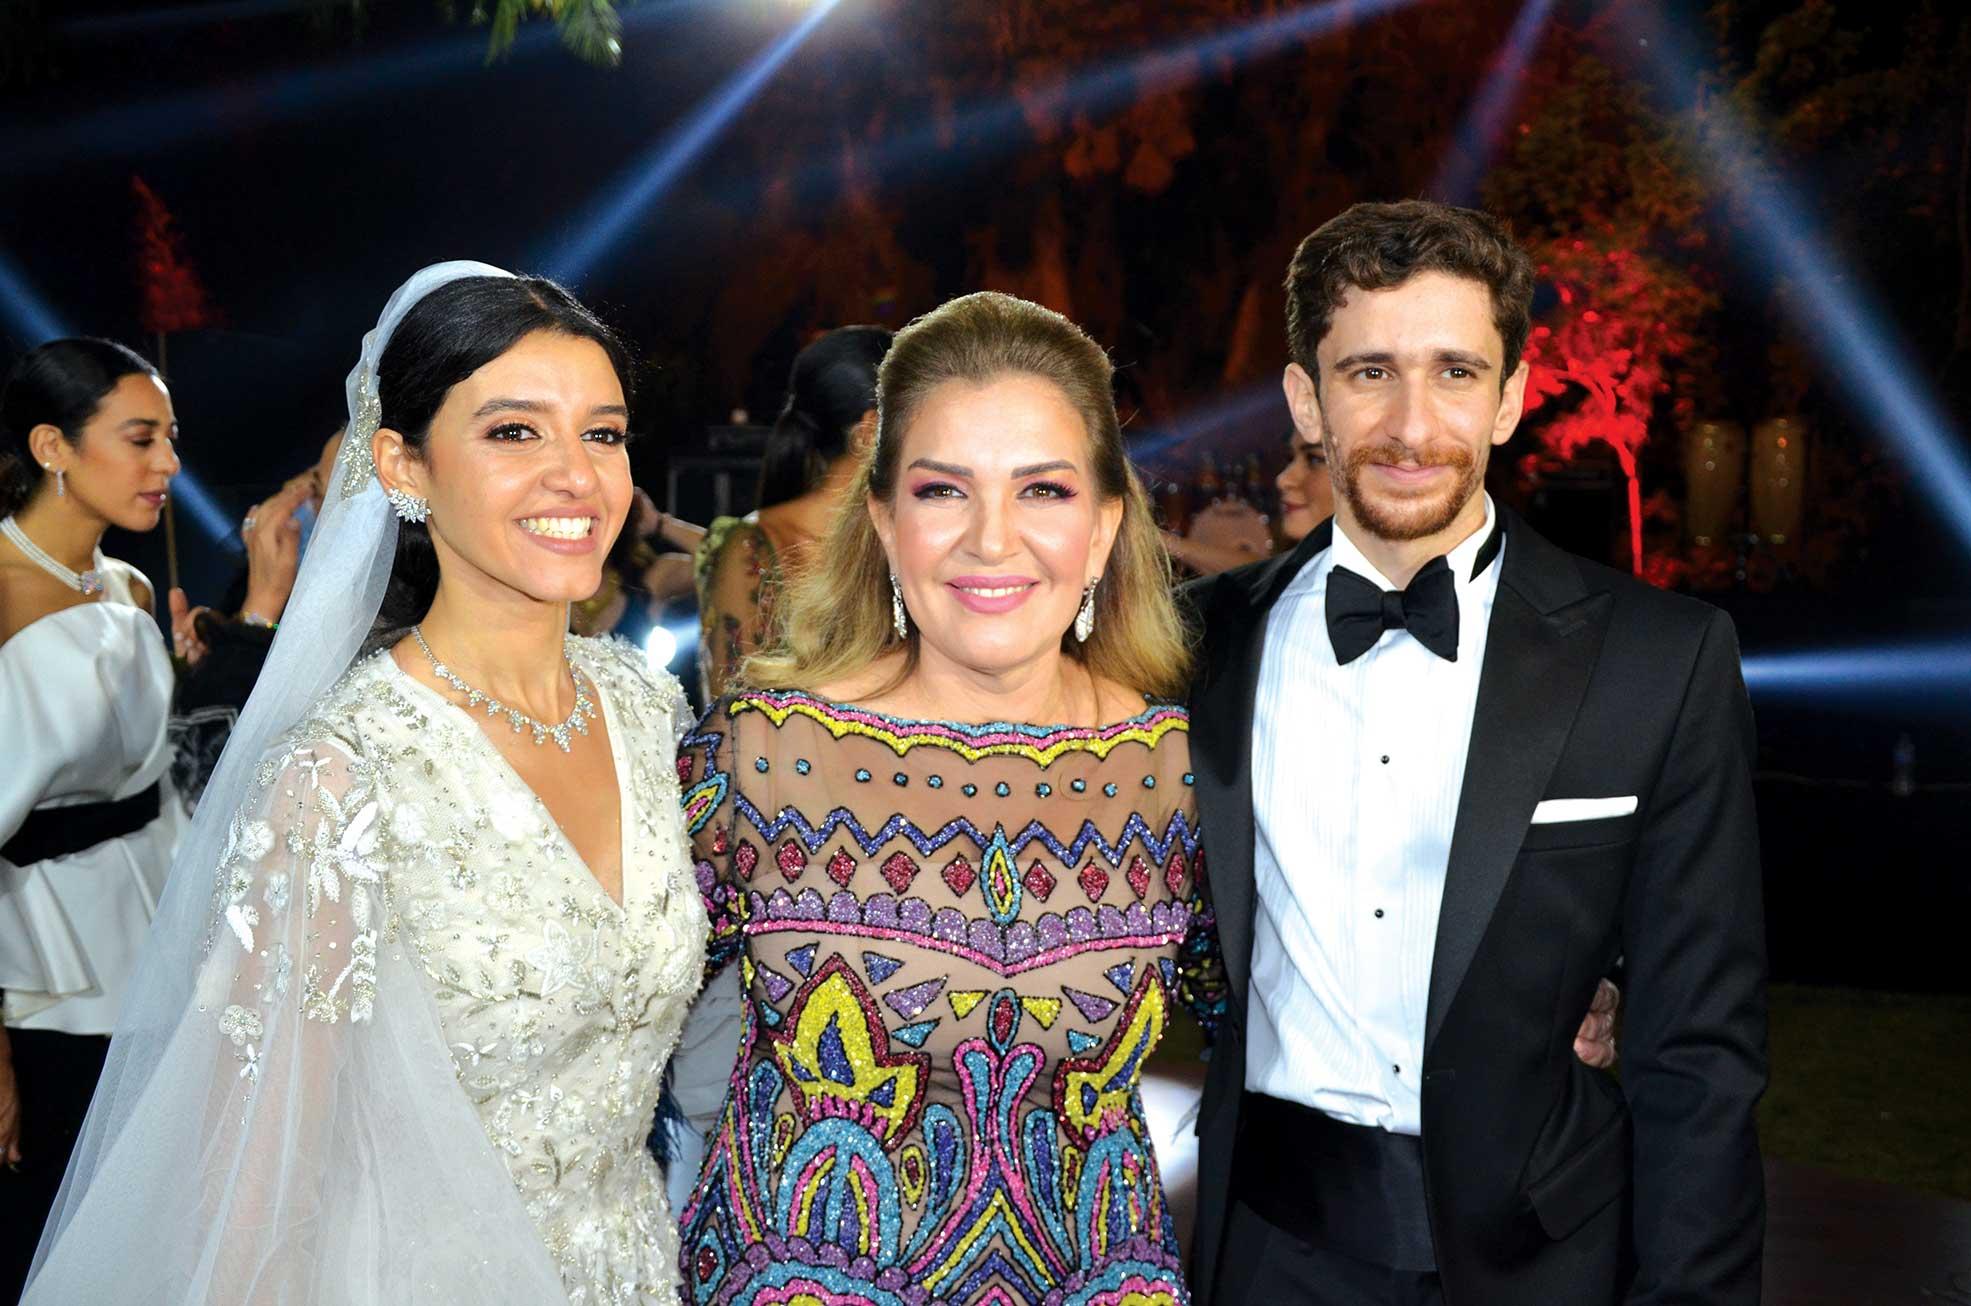 Ms. Farah ElMasry, Ms. Noha El Ayouti & Mr. Khaled Mostafa